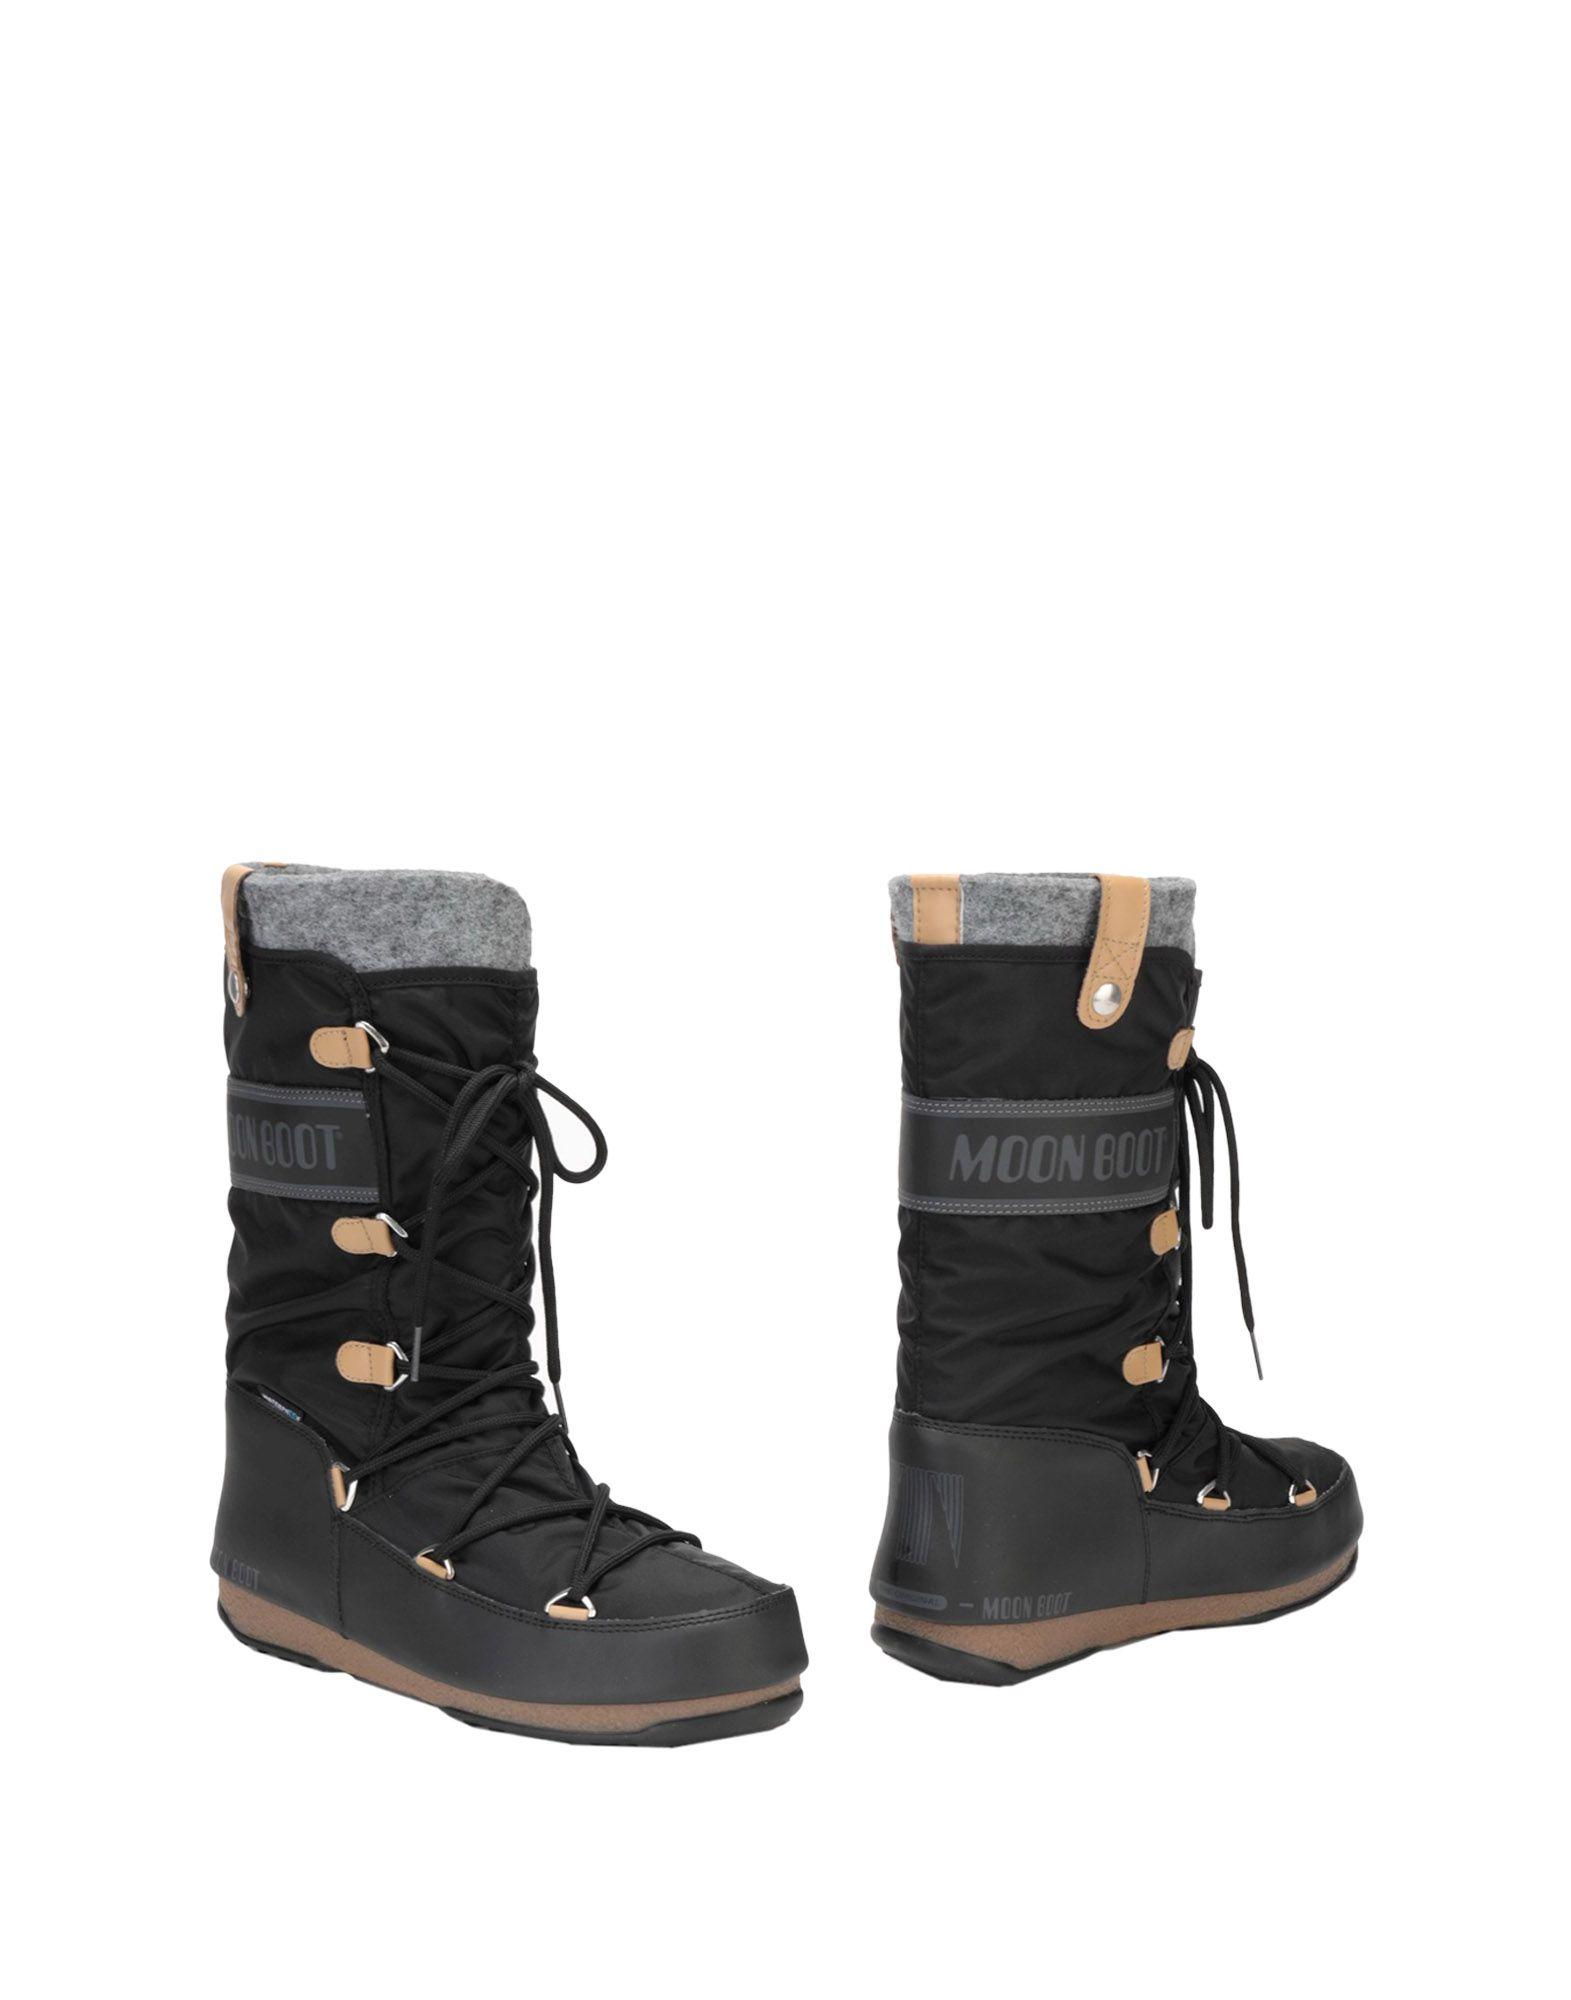 Stivali Moon Boot Monaco Felt Wp - Donna - 11333266UX